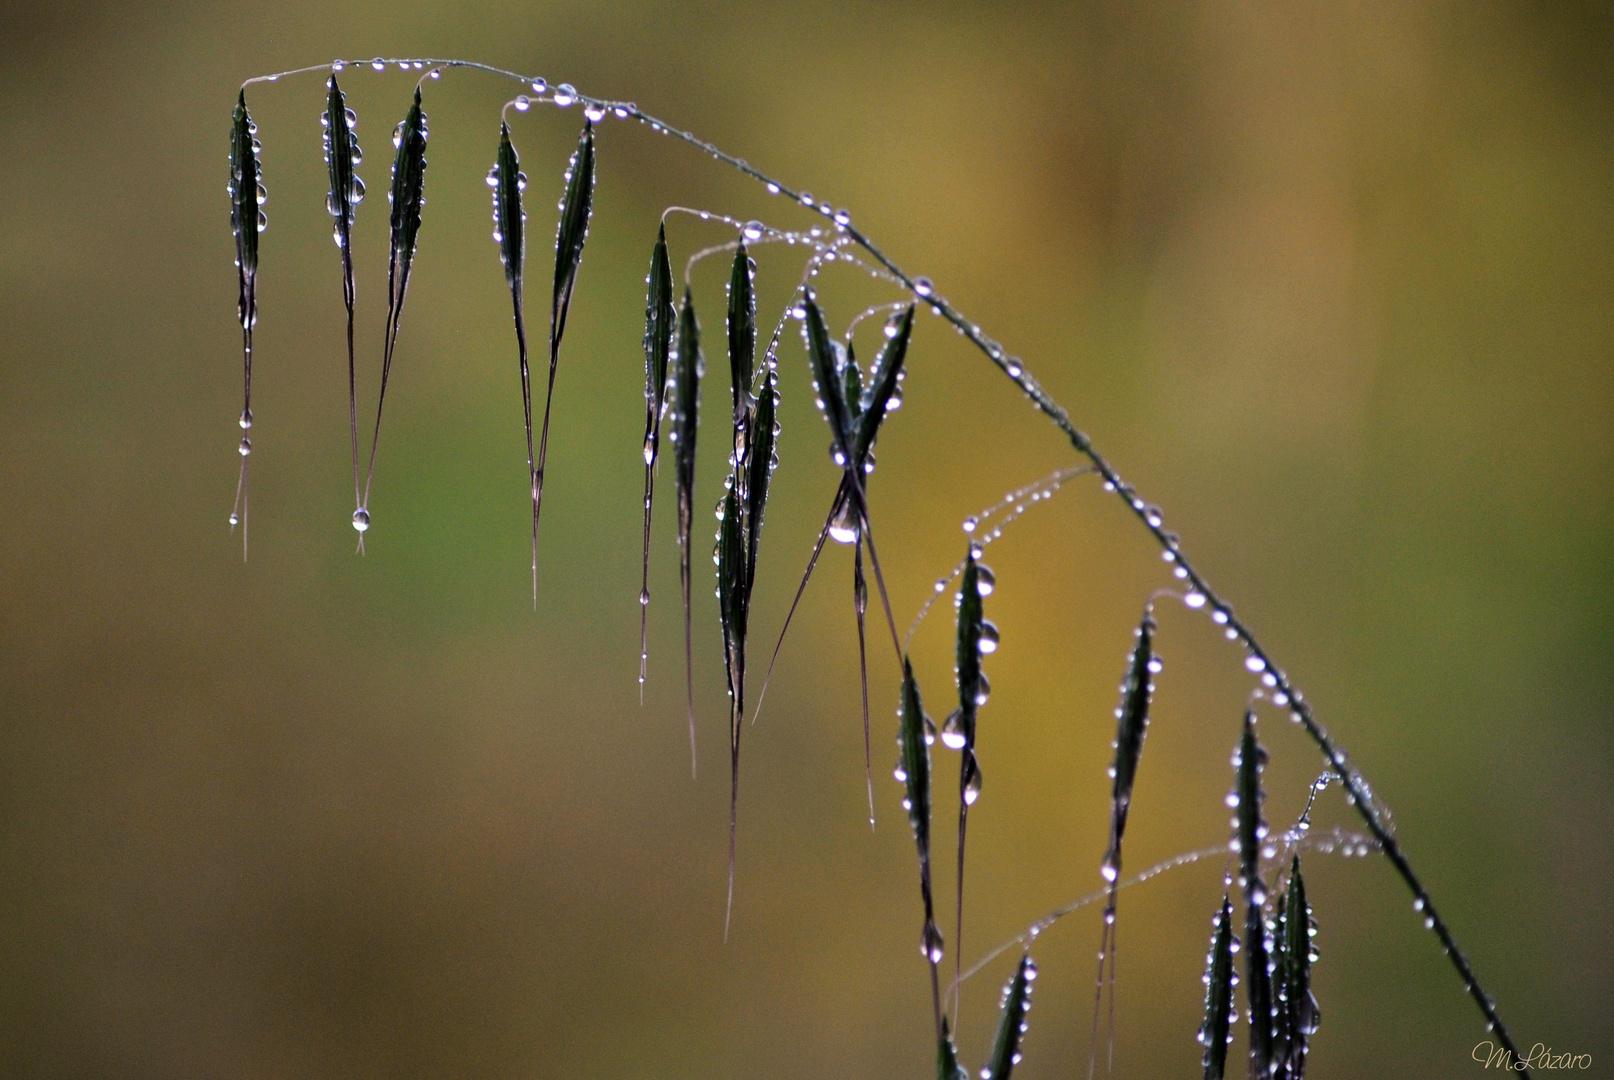 Otro dia de lluvia